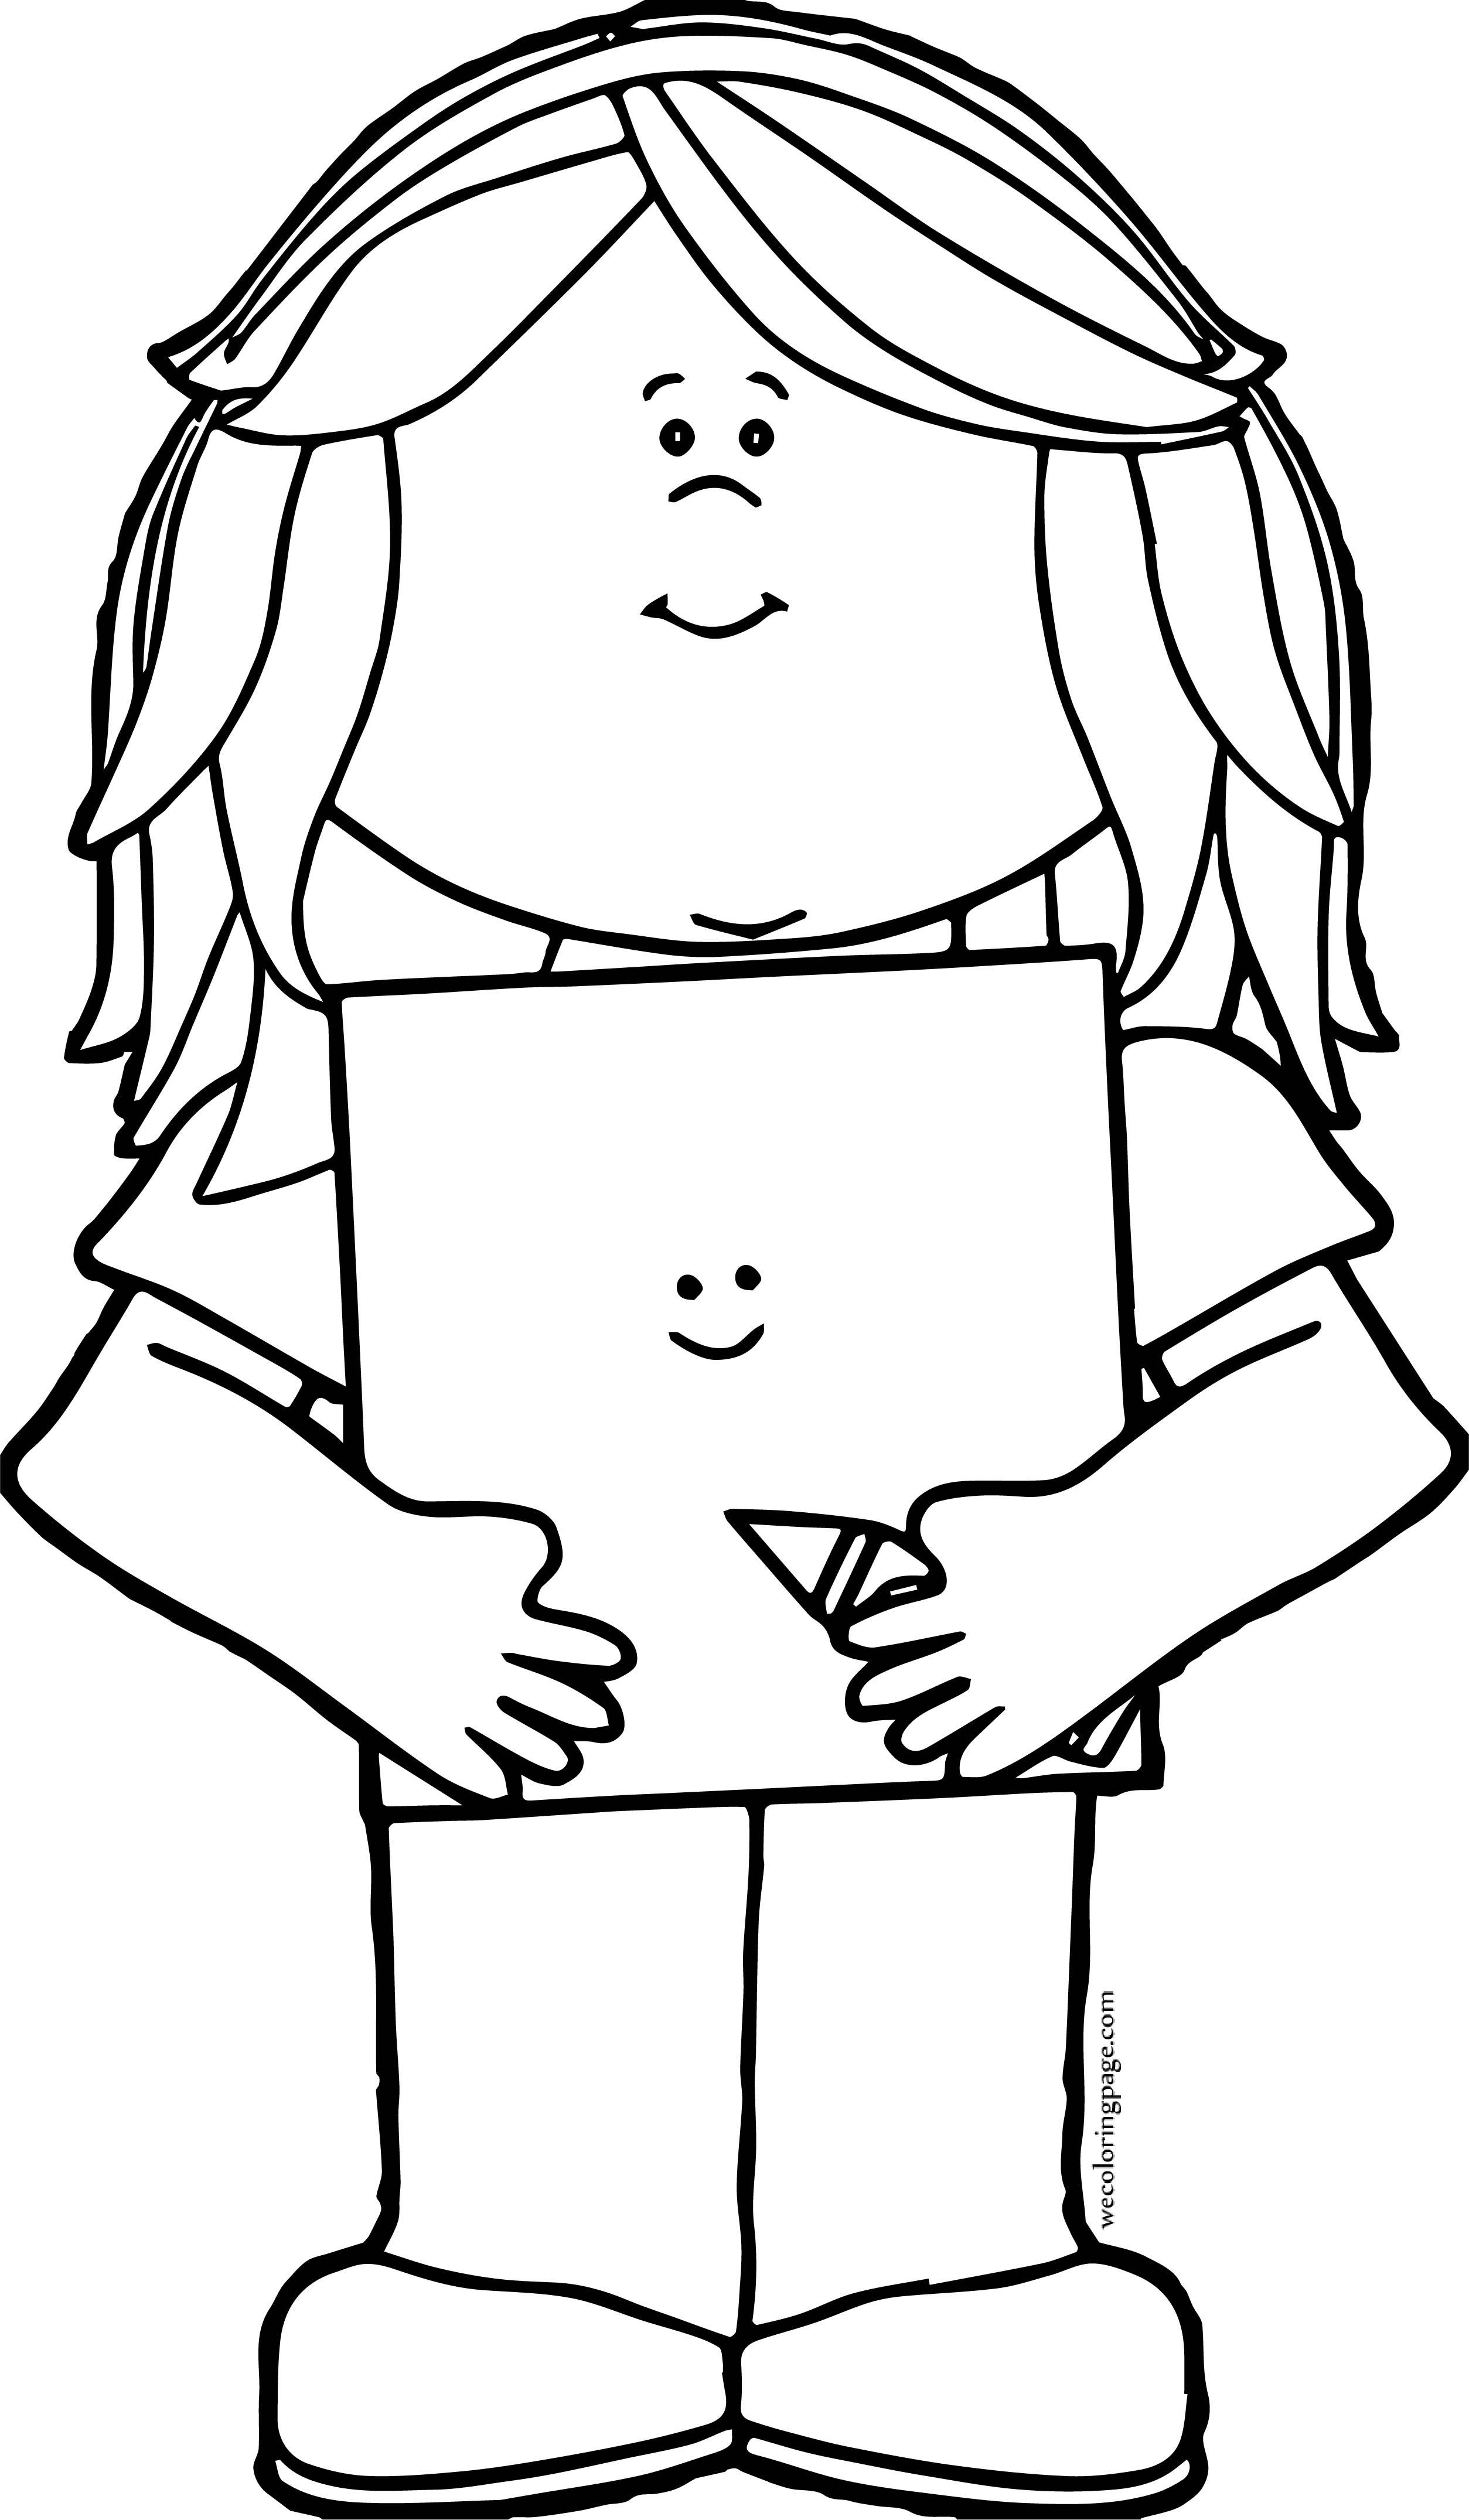 Crayon Girl Coloring Page